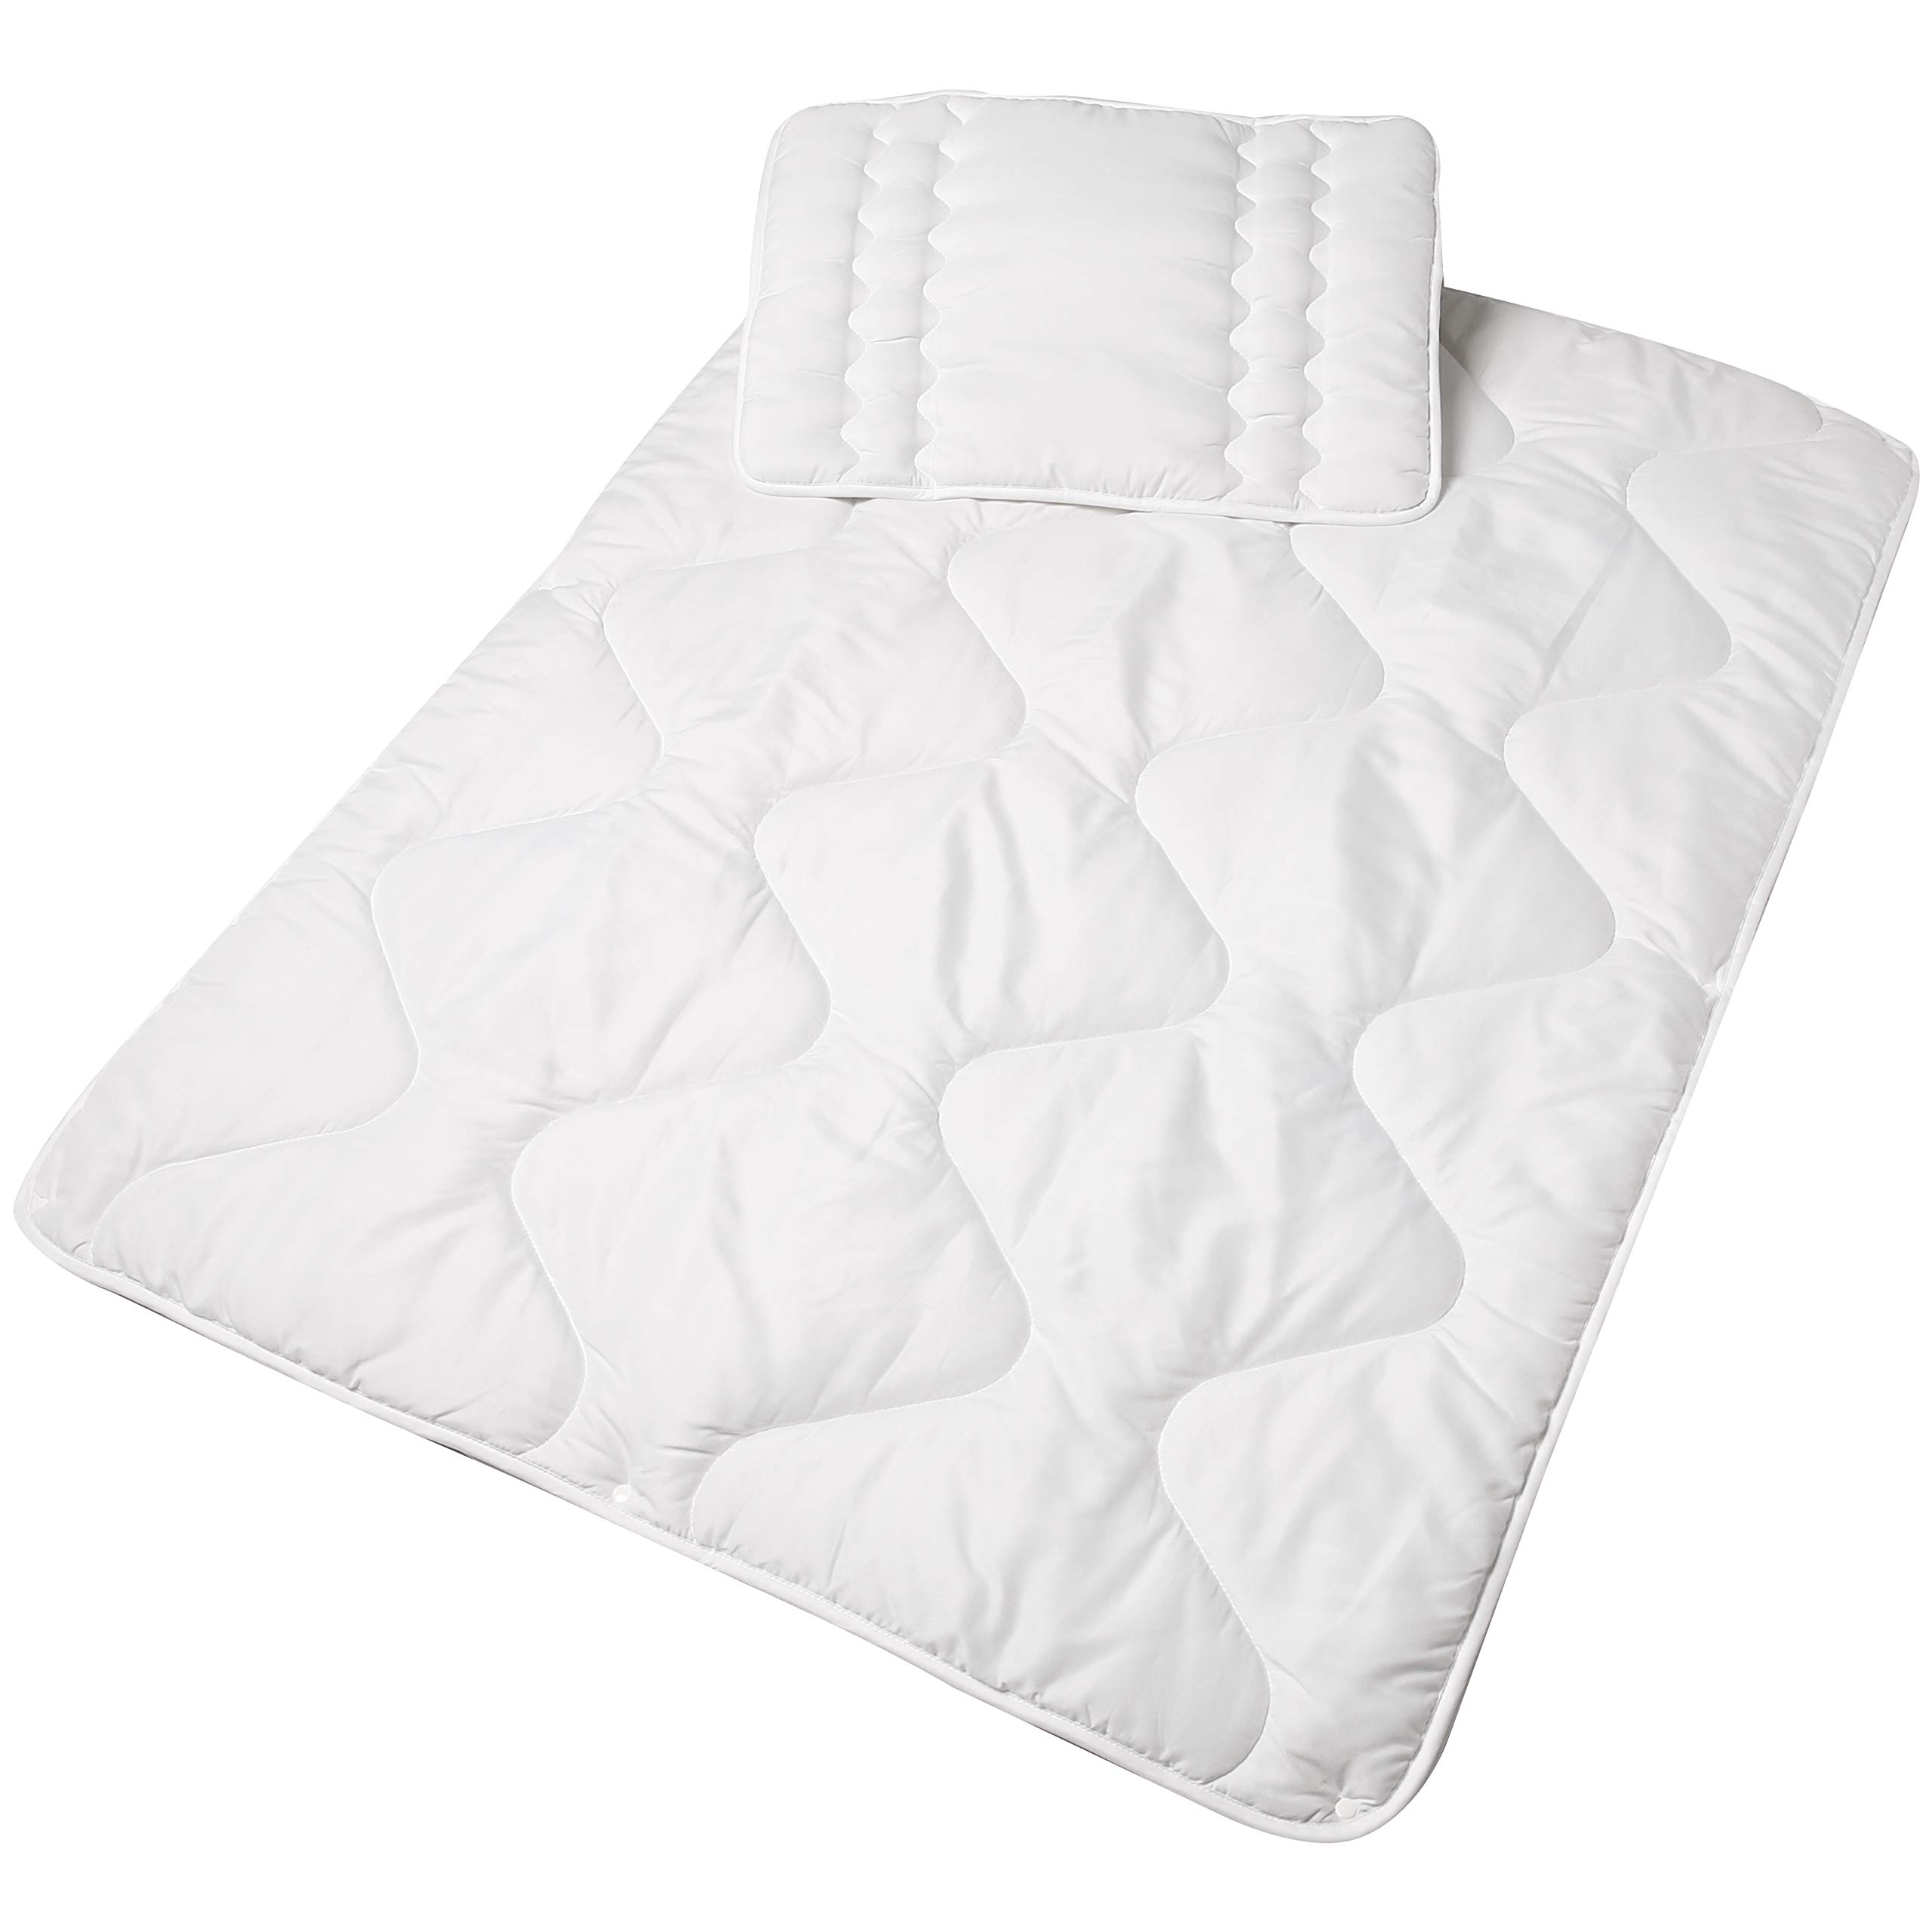 Amazon Basics Baby Duvet Set, 4-Season, 100x135 cm, White